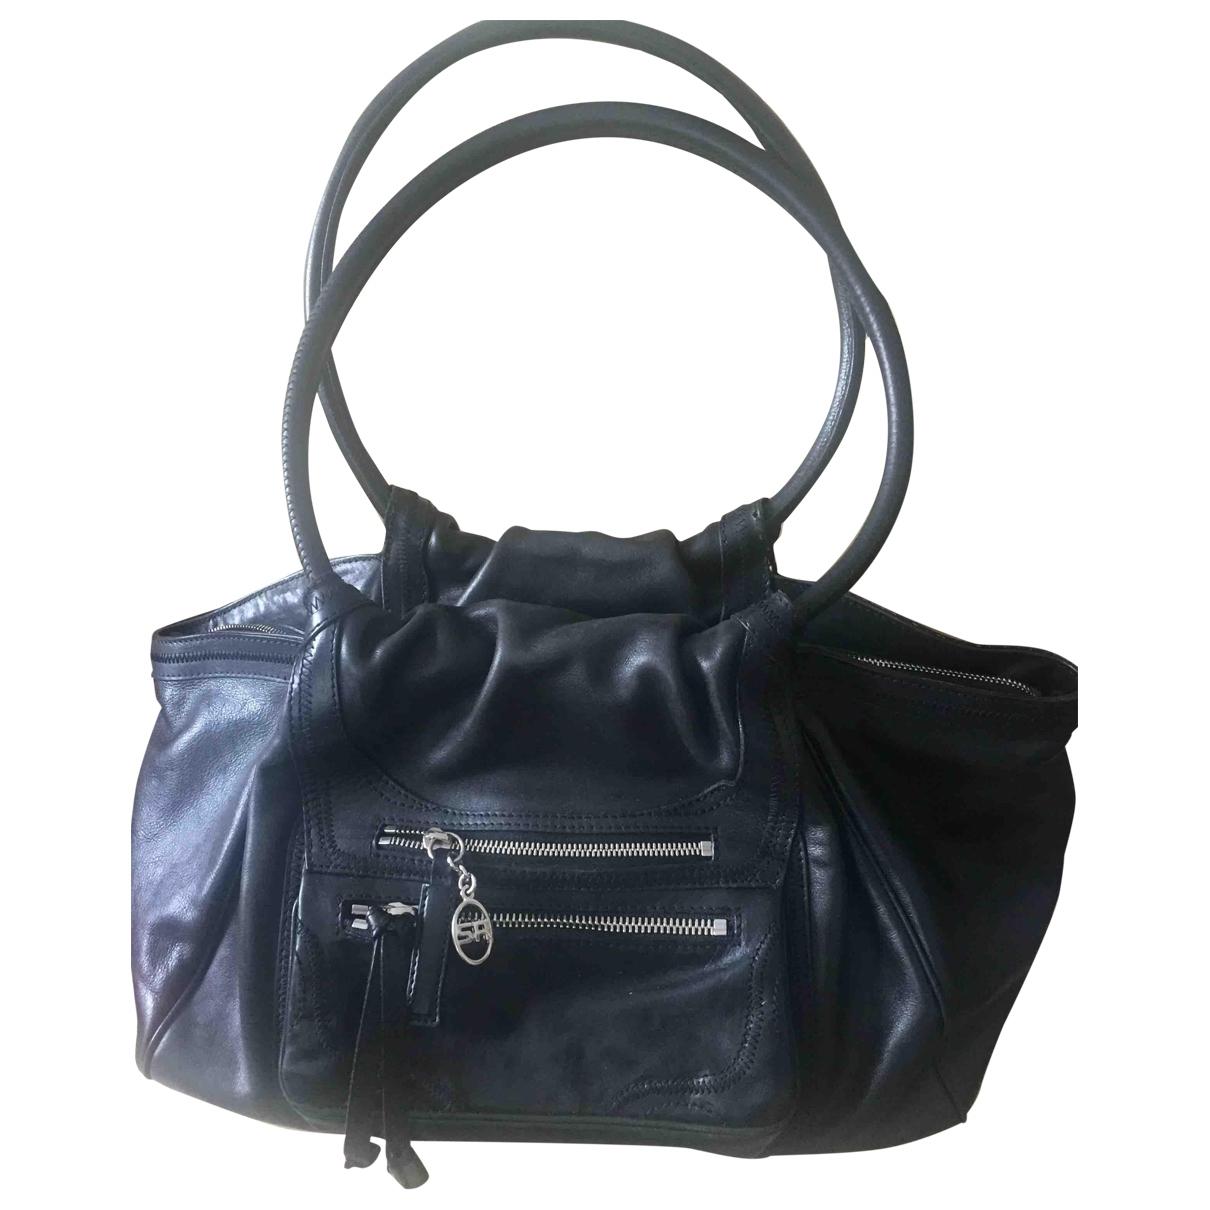 Sonia Rykiel \N Black Leather handbag for Women \N